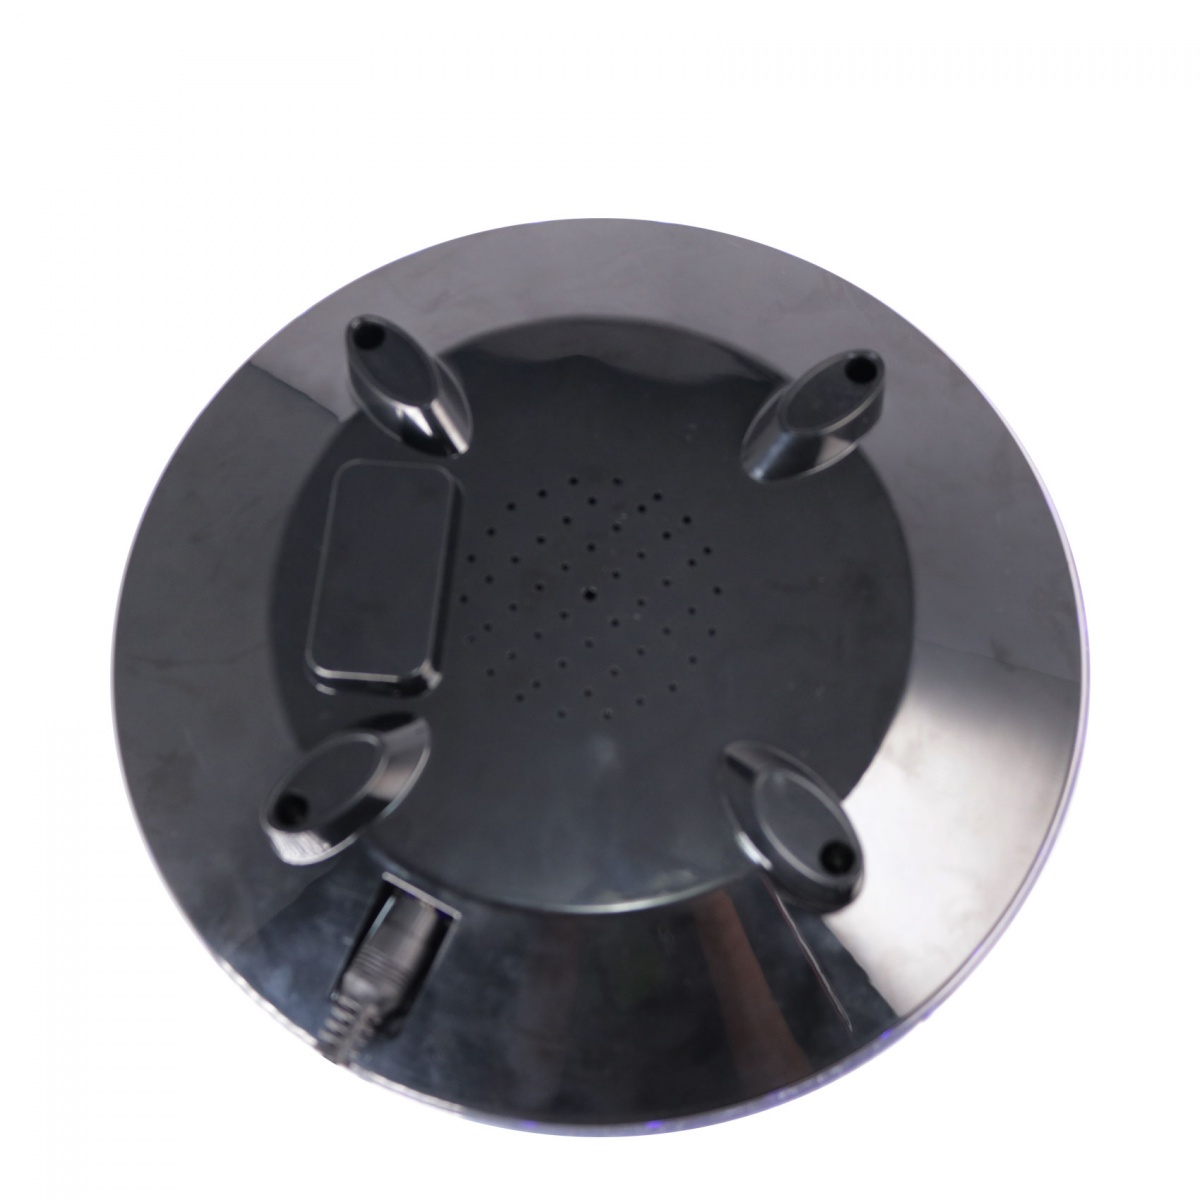 Electromagnetic Levitation Display Highlighter - Black